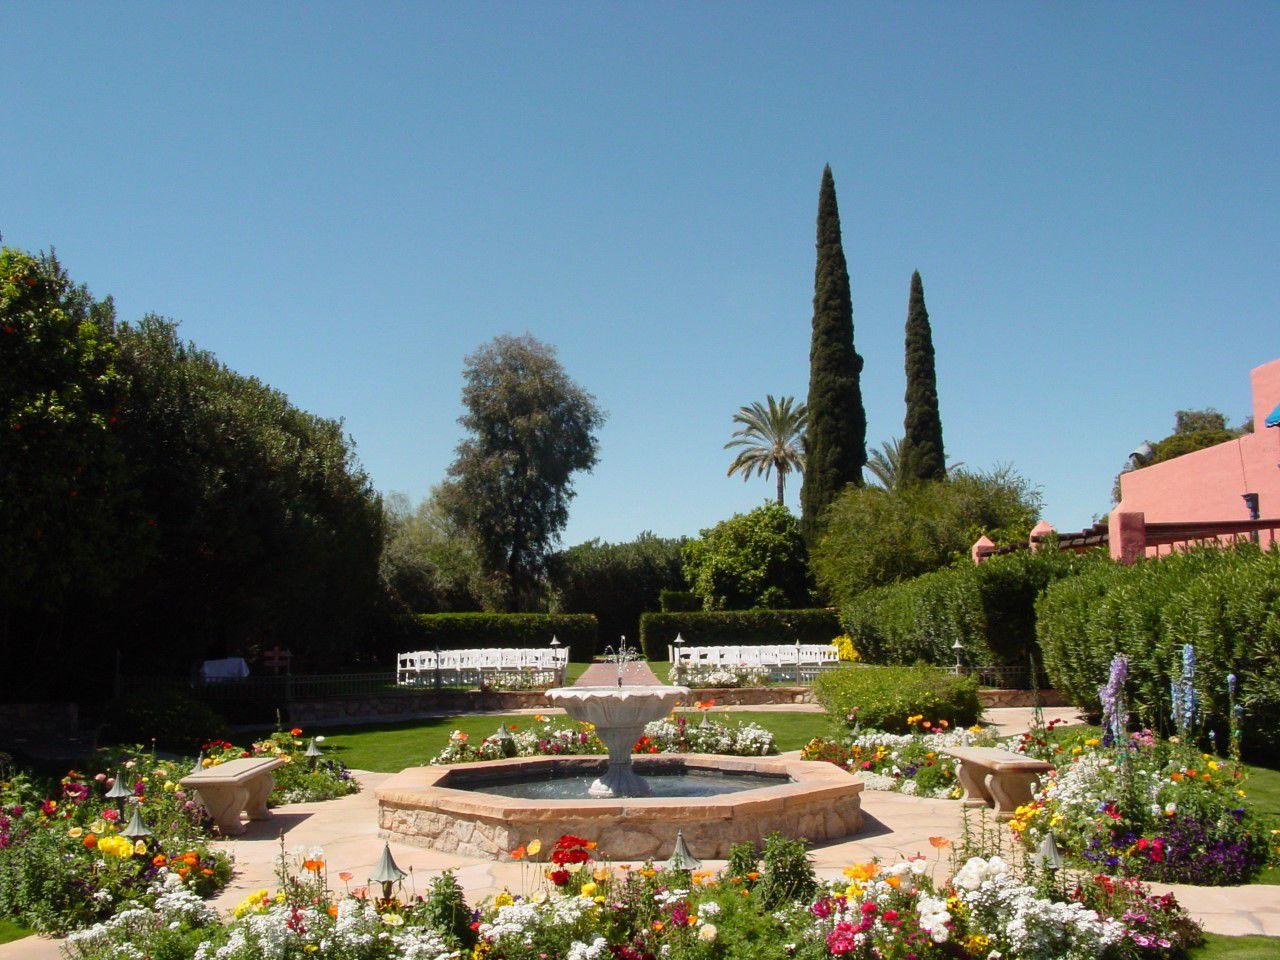 Wedding Venues | Tucson Wedding Guide|Venues | tucson.com